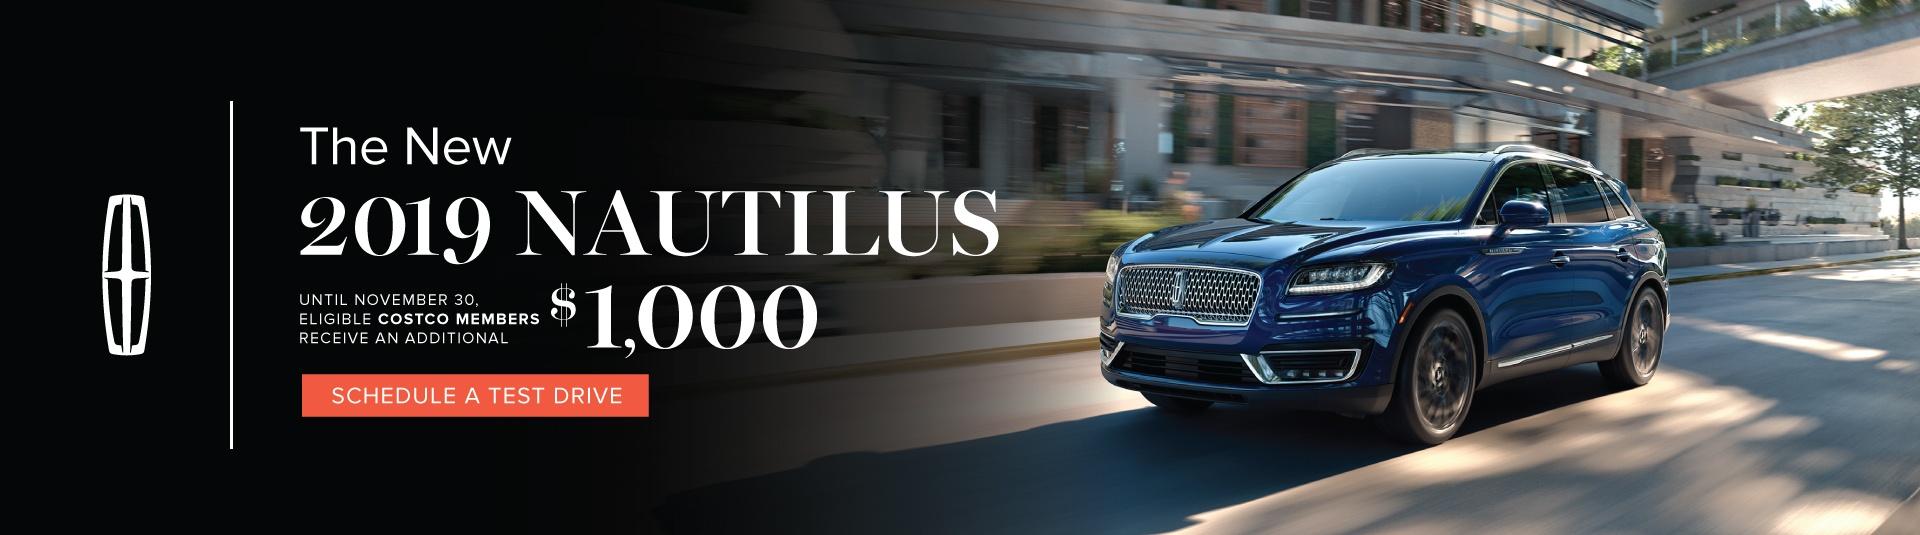 The New 2019 Nautilus